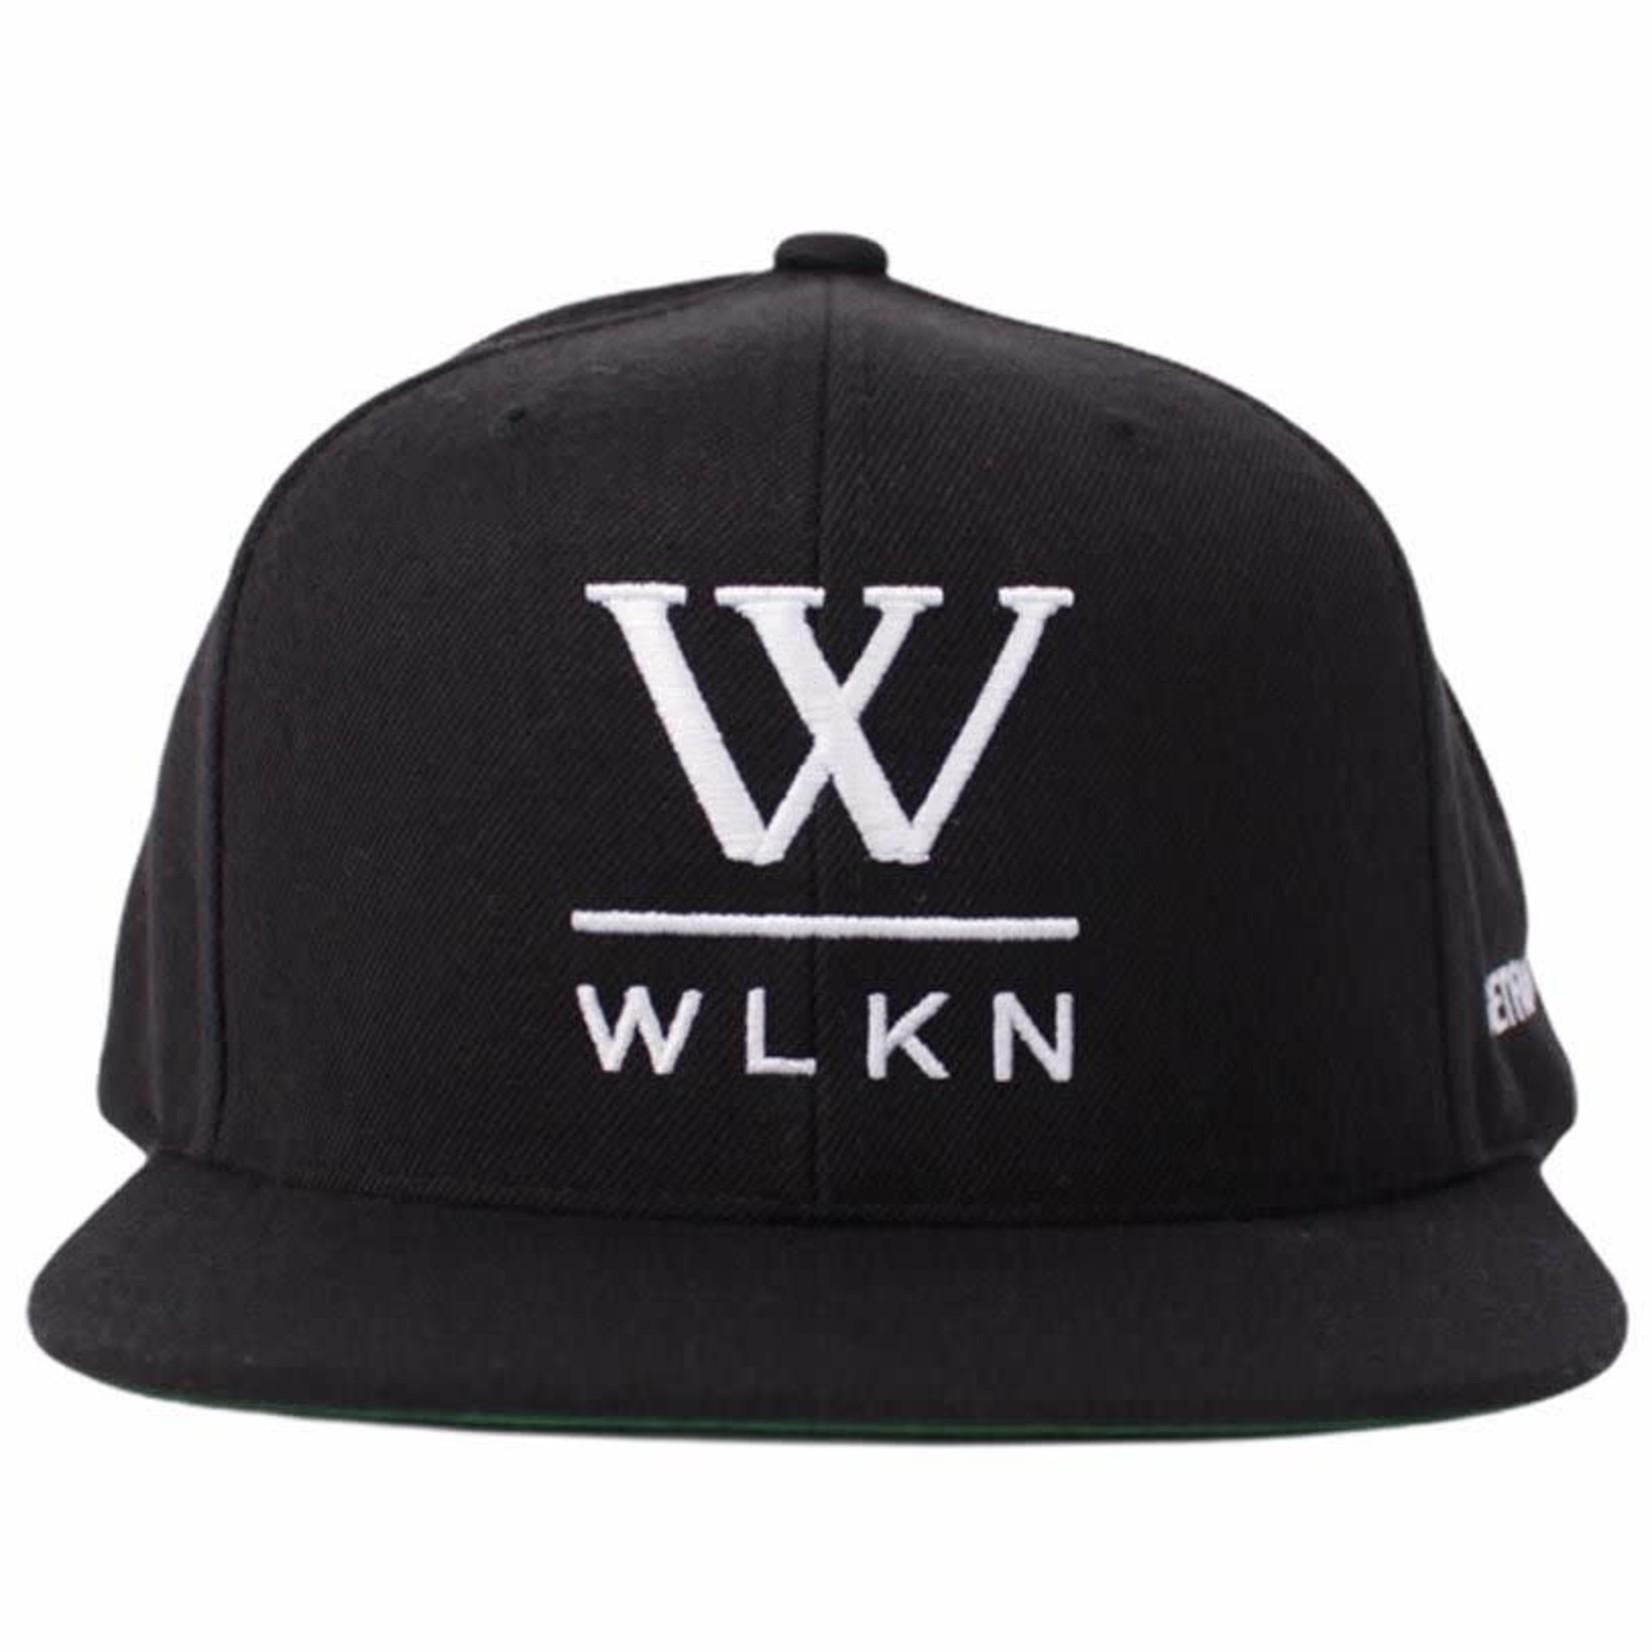 WLKN WLKN : WLKN - Basic Signature x #GETFAMILIAR Logo Snapback Black OS